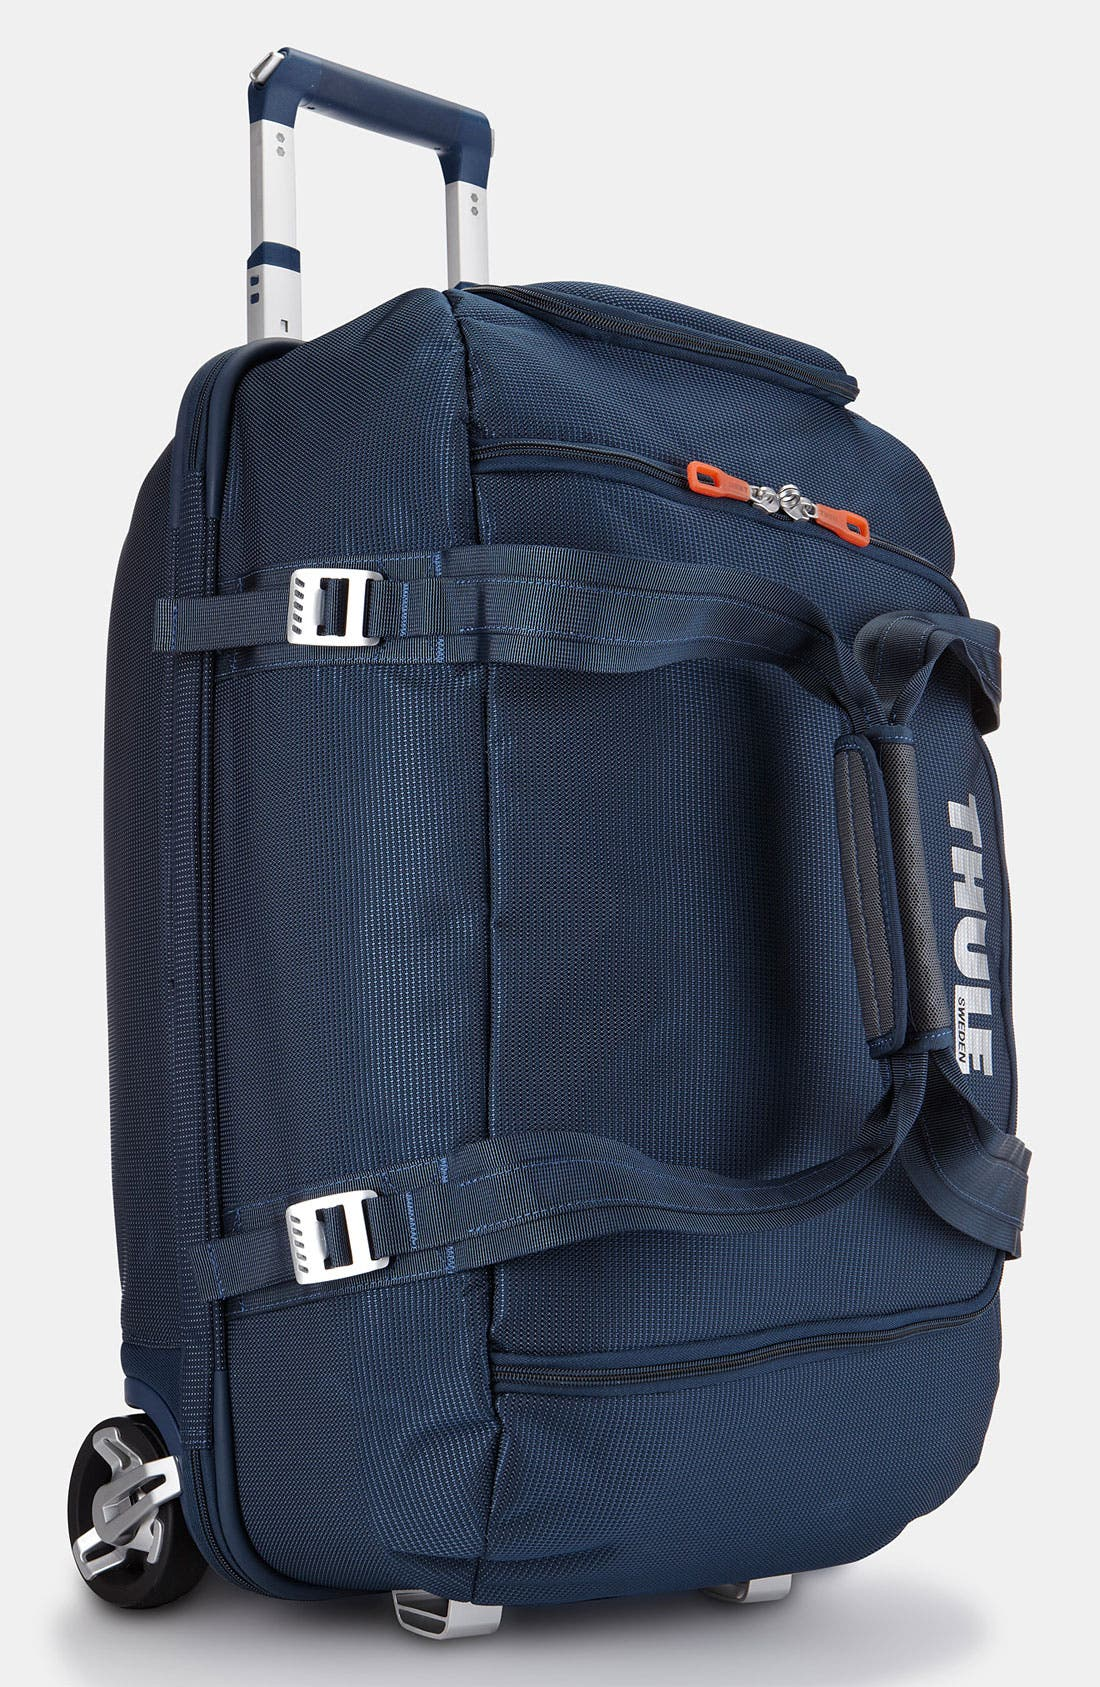 Alternate Image 1 Selected - Thule 'Crossover' Rolling Duffel Bag (56L)